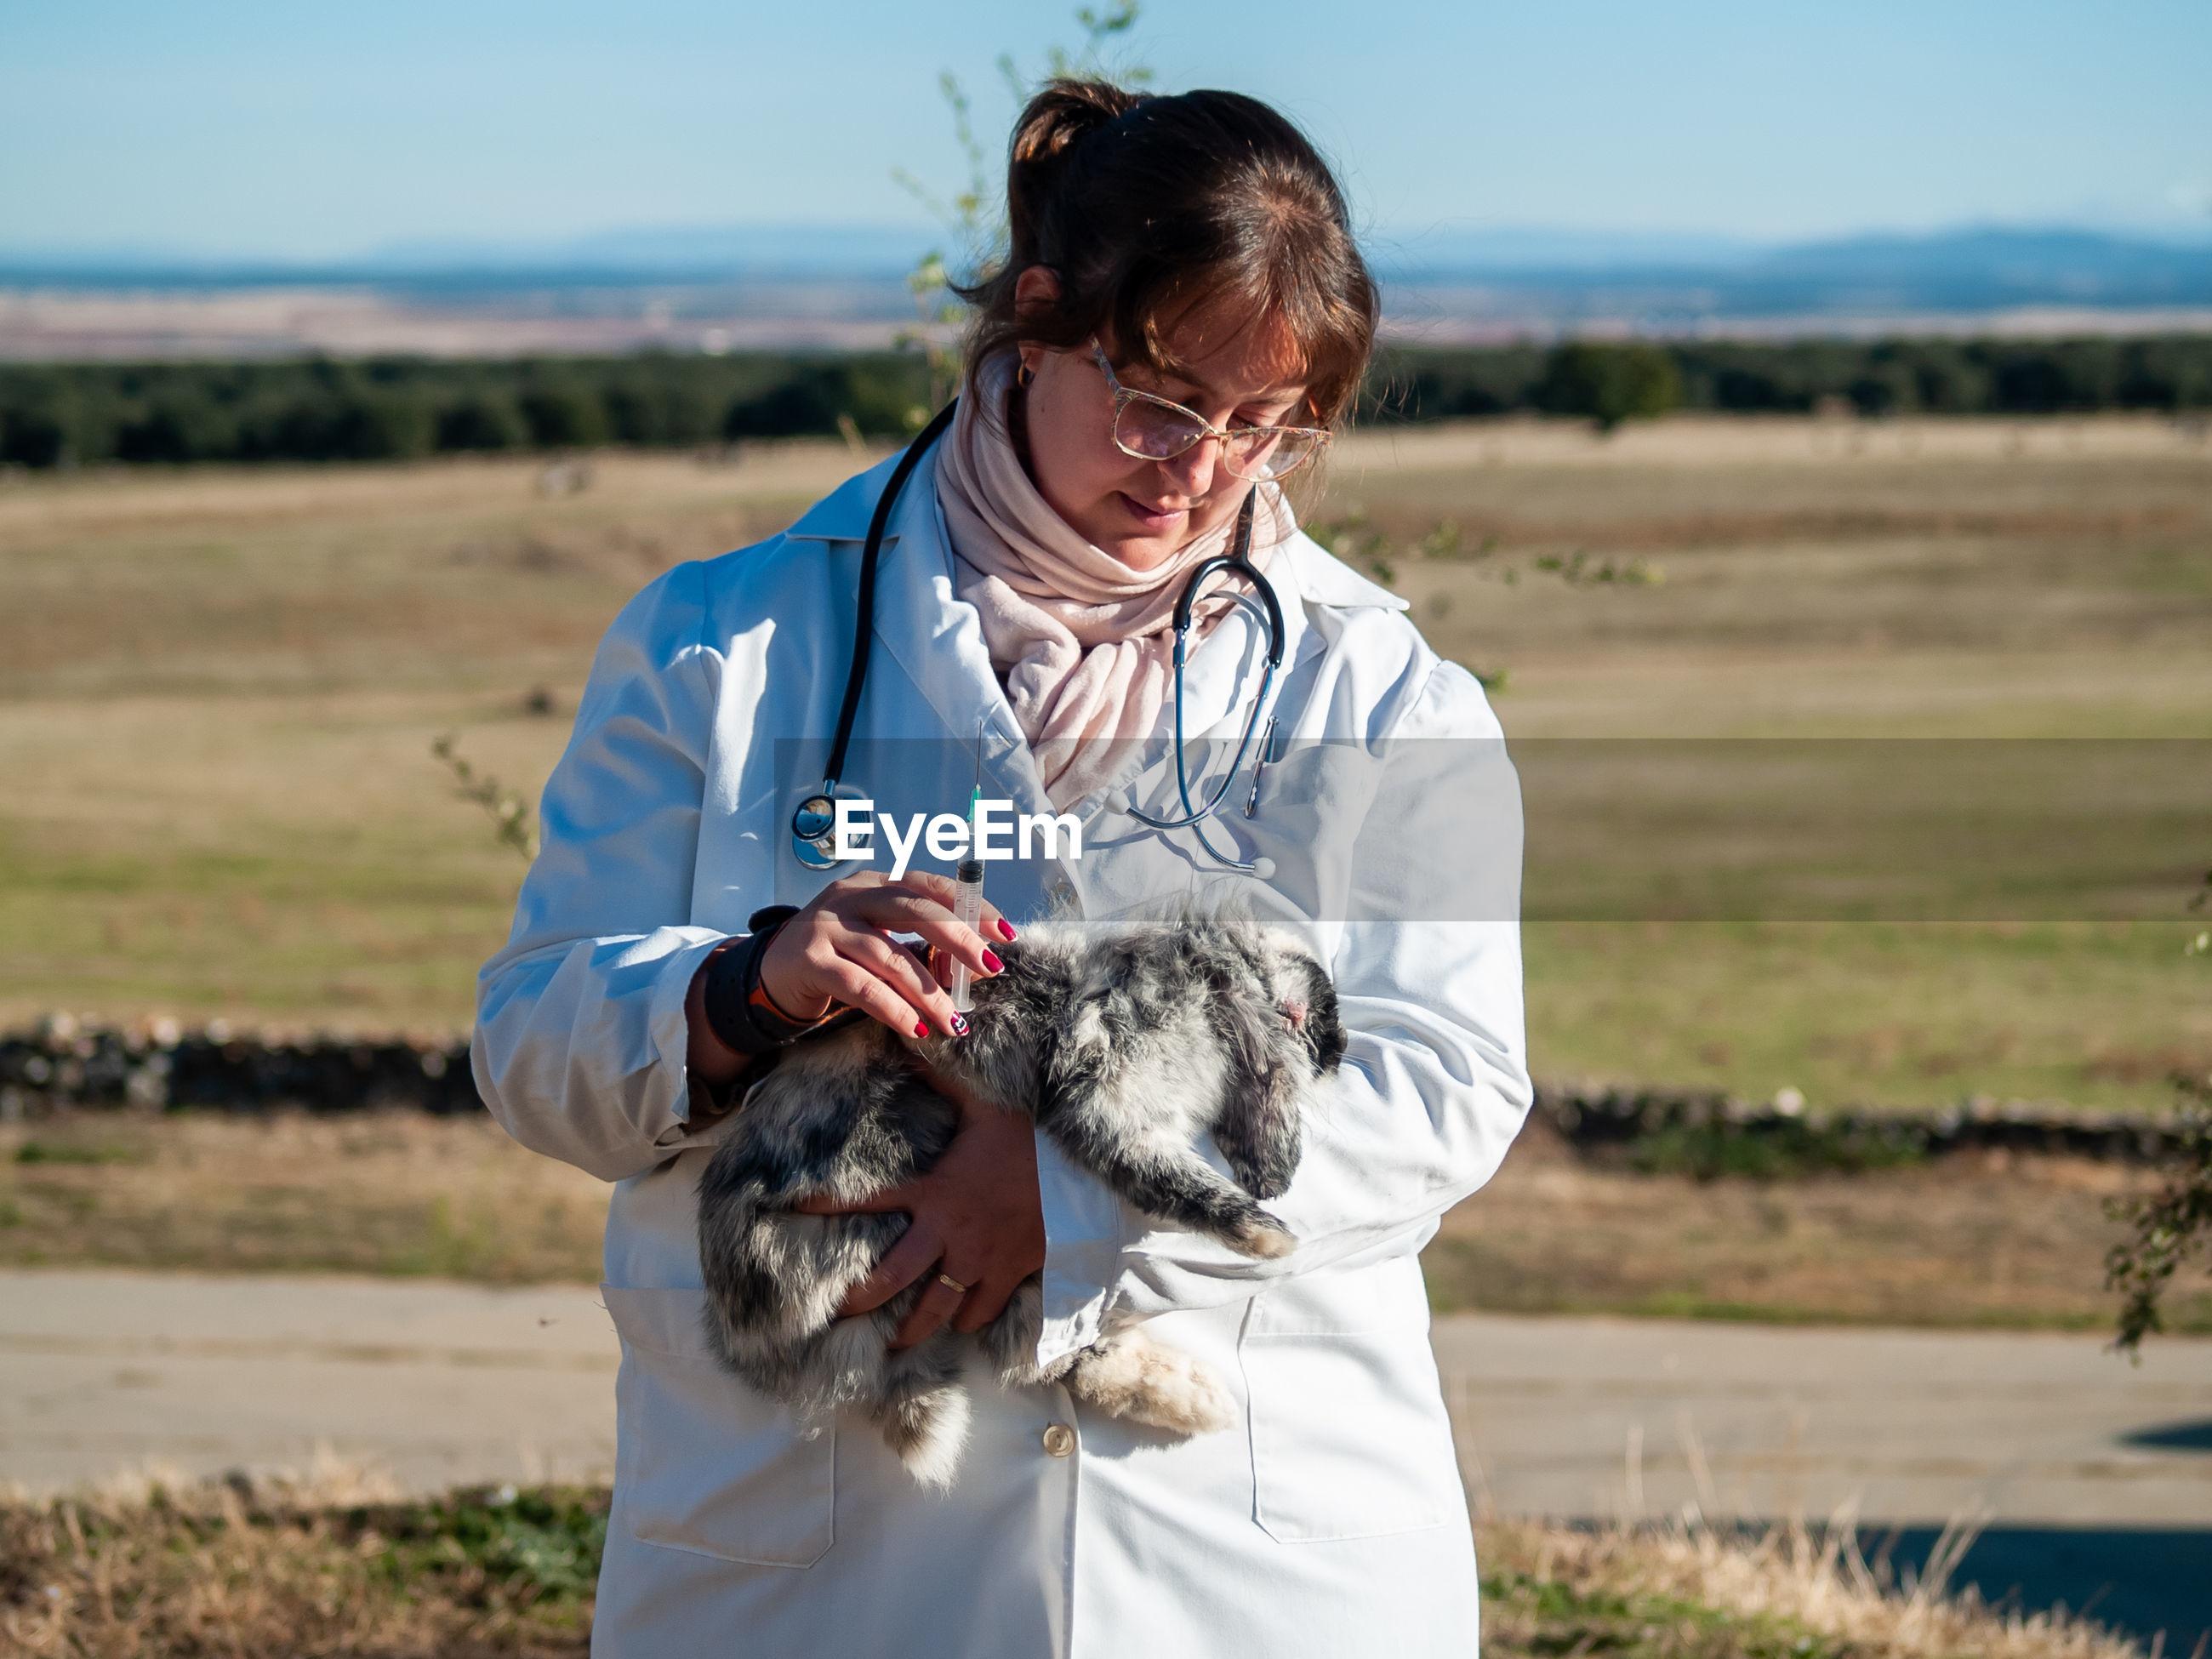 Doctor examining rabbit with stethoscope